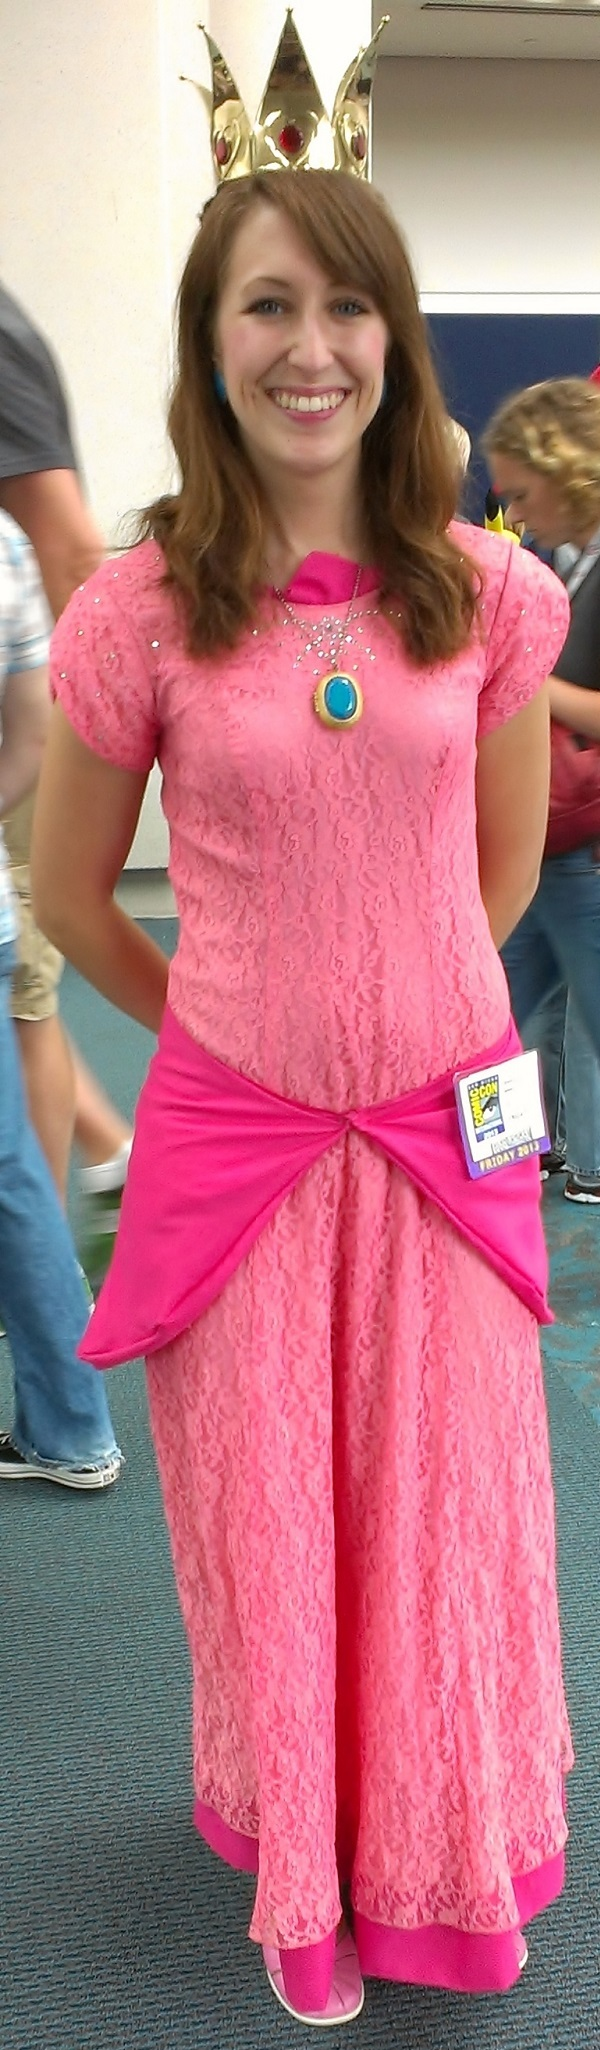 Princess Cosplayer at Comic-Con 2013